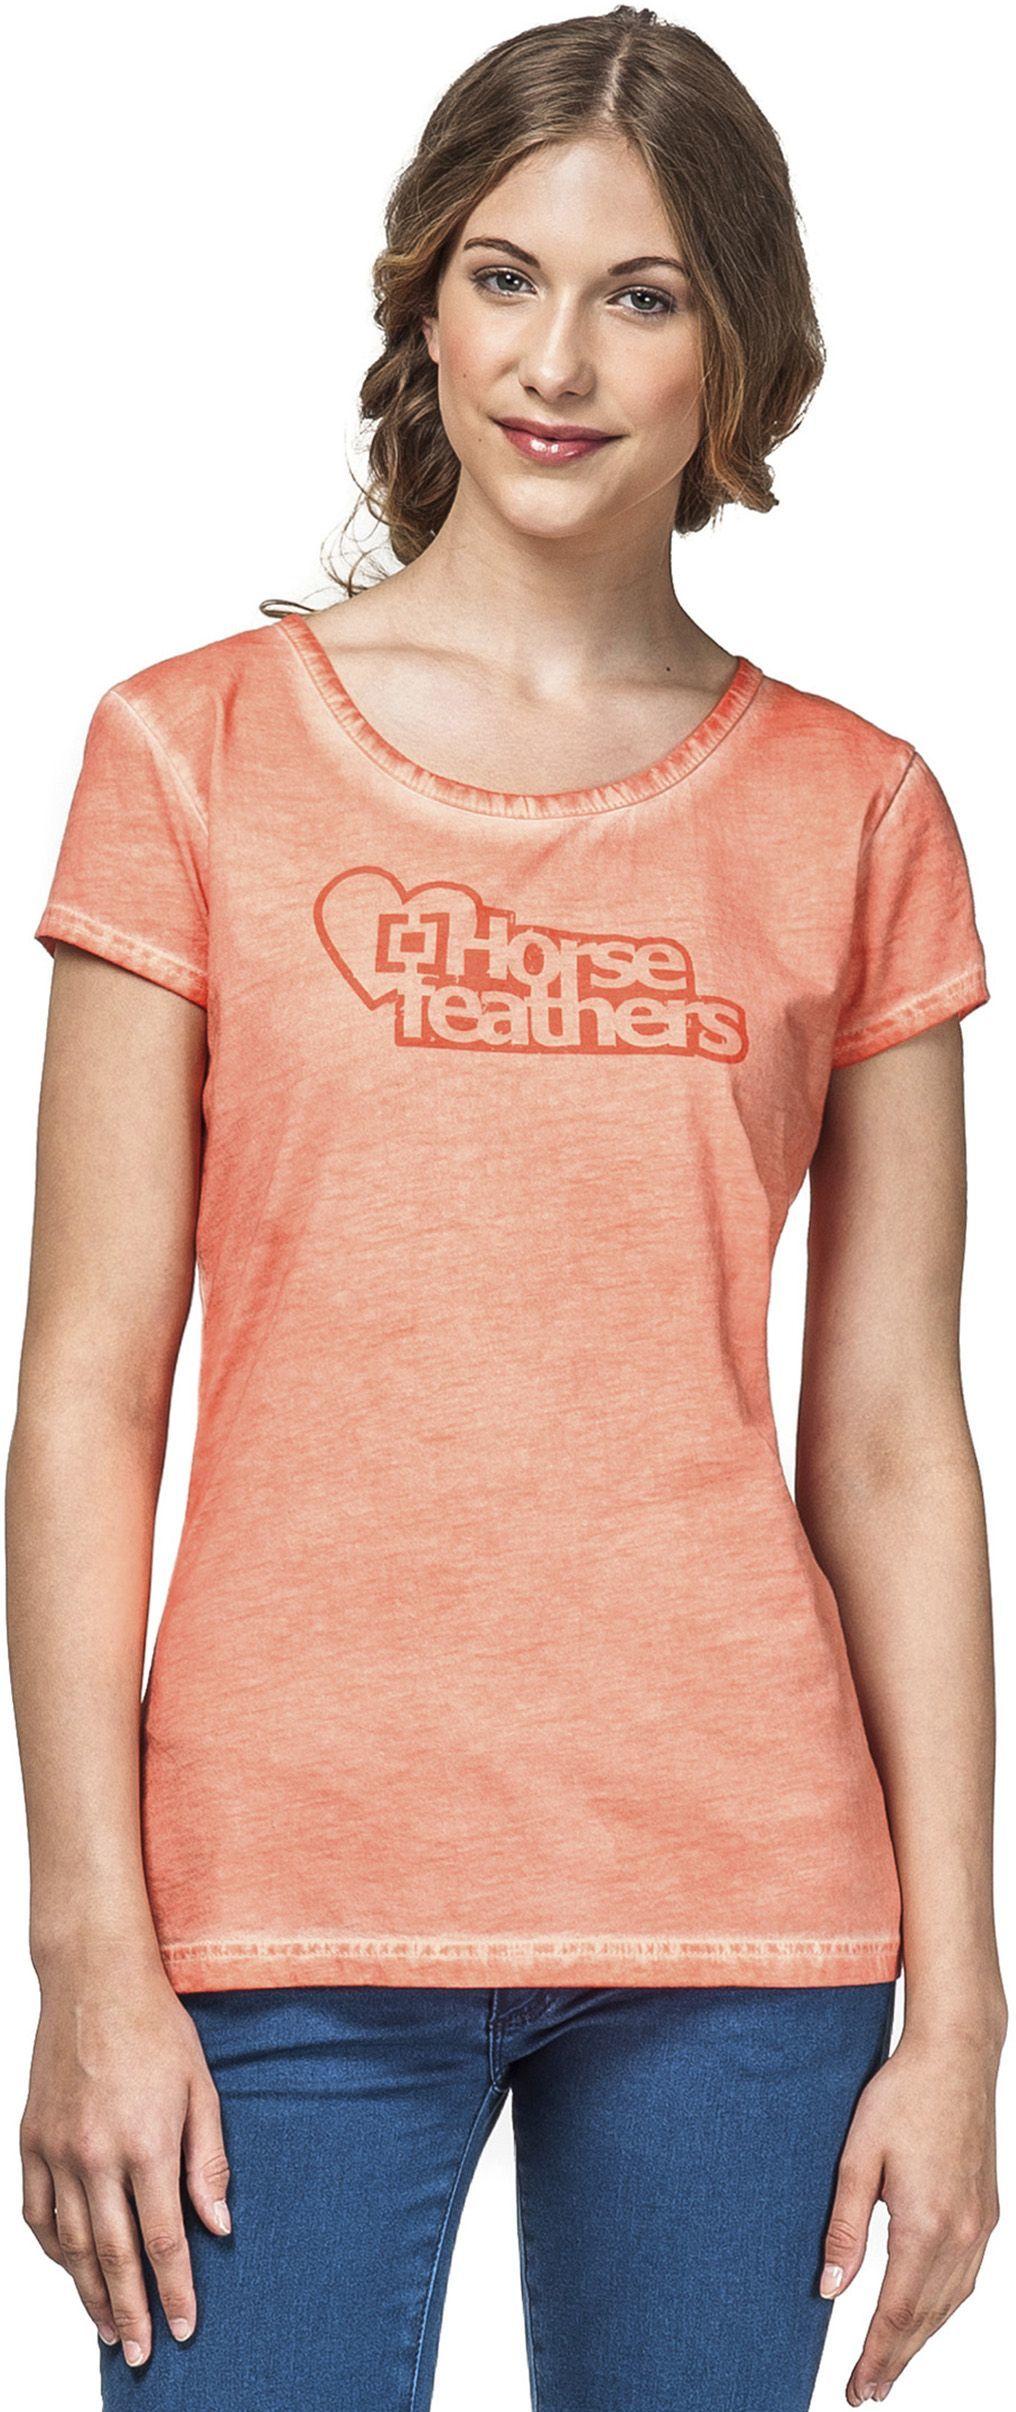 t-shirt damski HORSEFEATHERS LOVE LOGO TOP (washed peach)